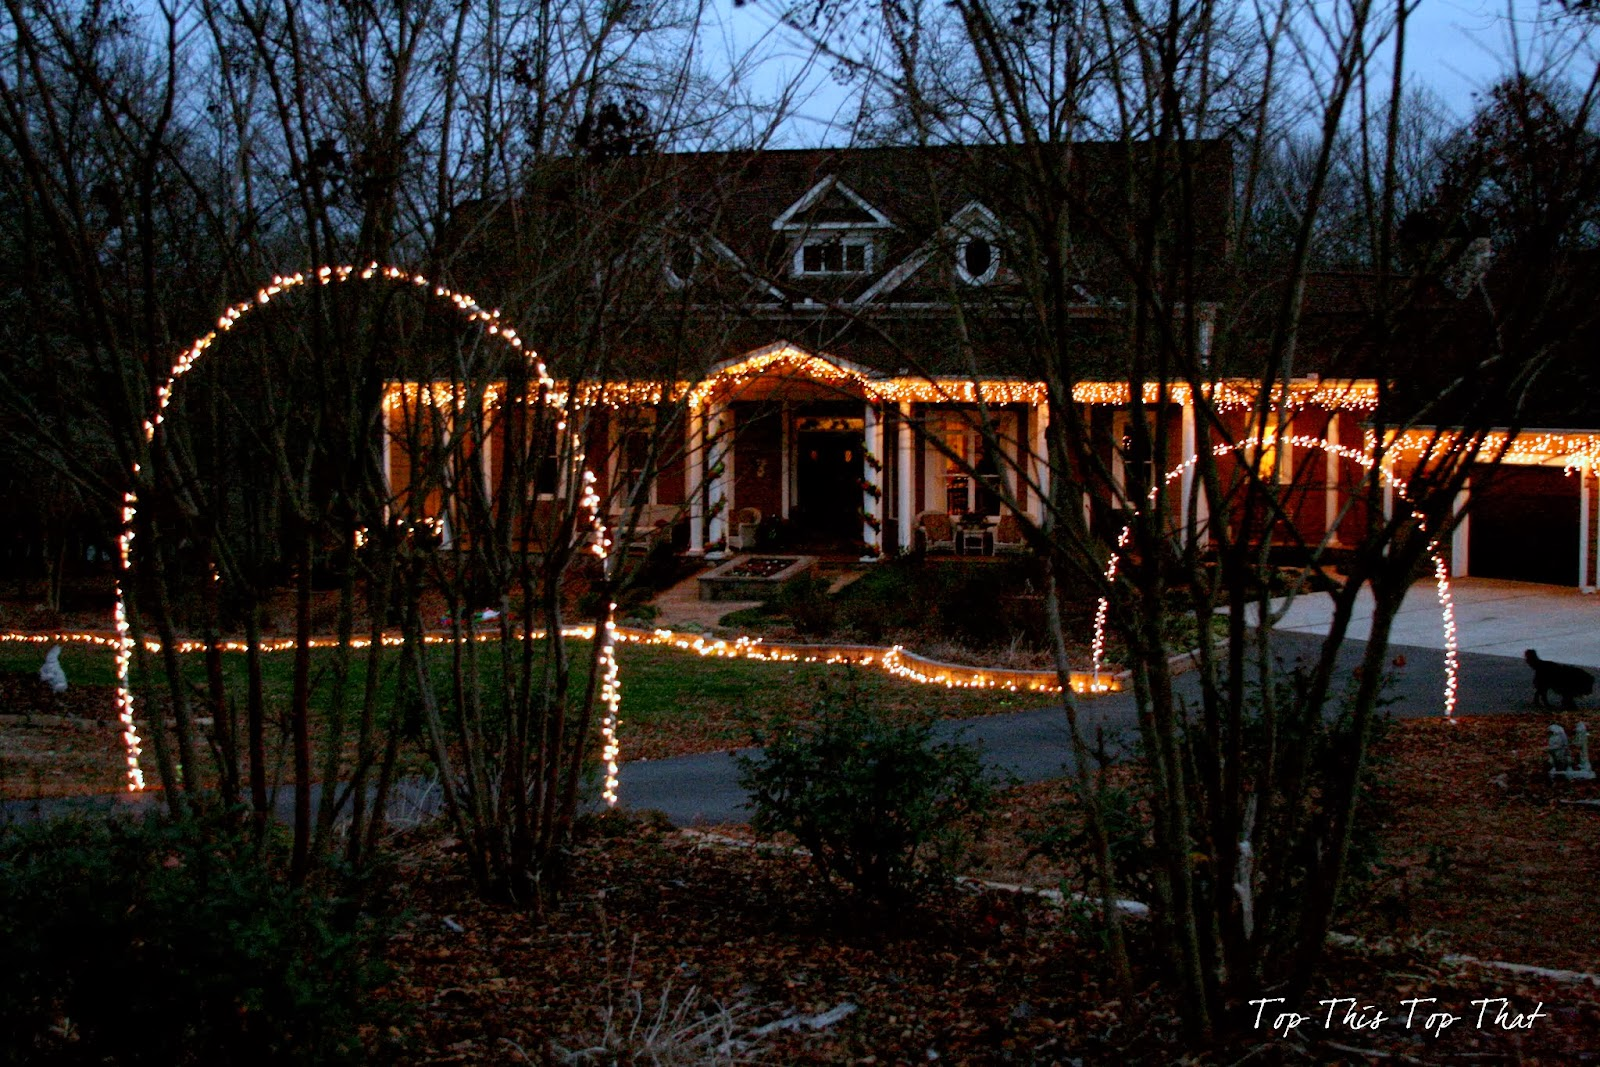 Outdoor Holiday Lighting Ideas - Duke Manor Farm